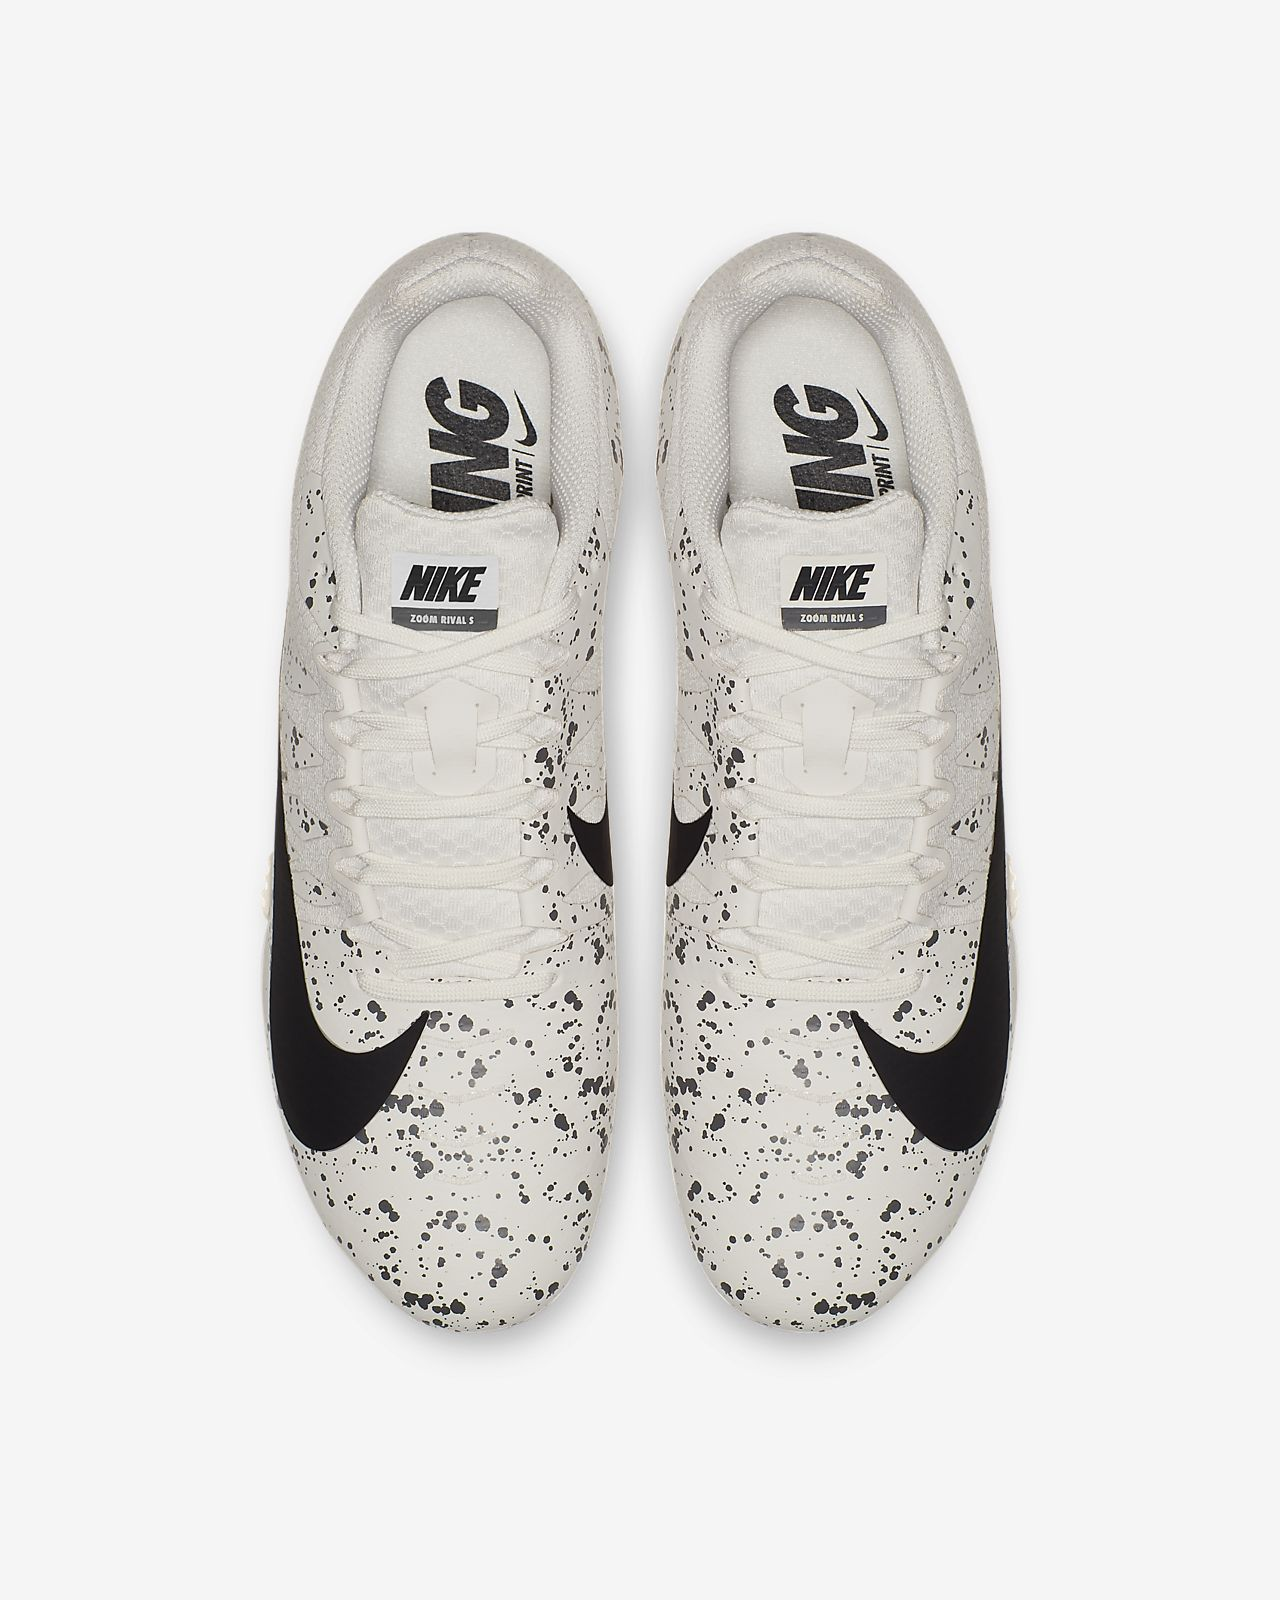 uk availability 9227b e9108 ... Scarpa chiodata per atletica Nike Zoom Rival S 9 - Unisex